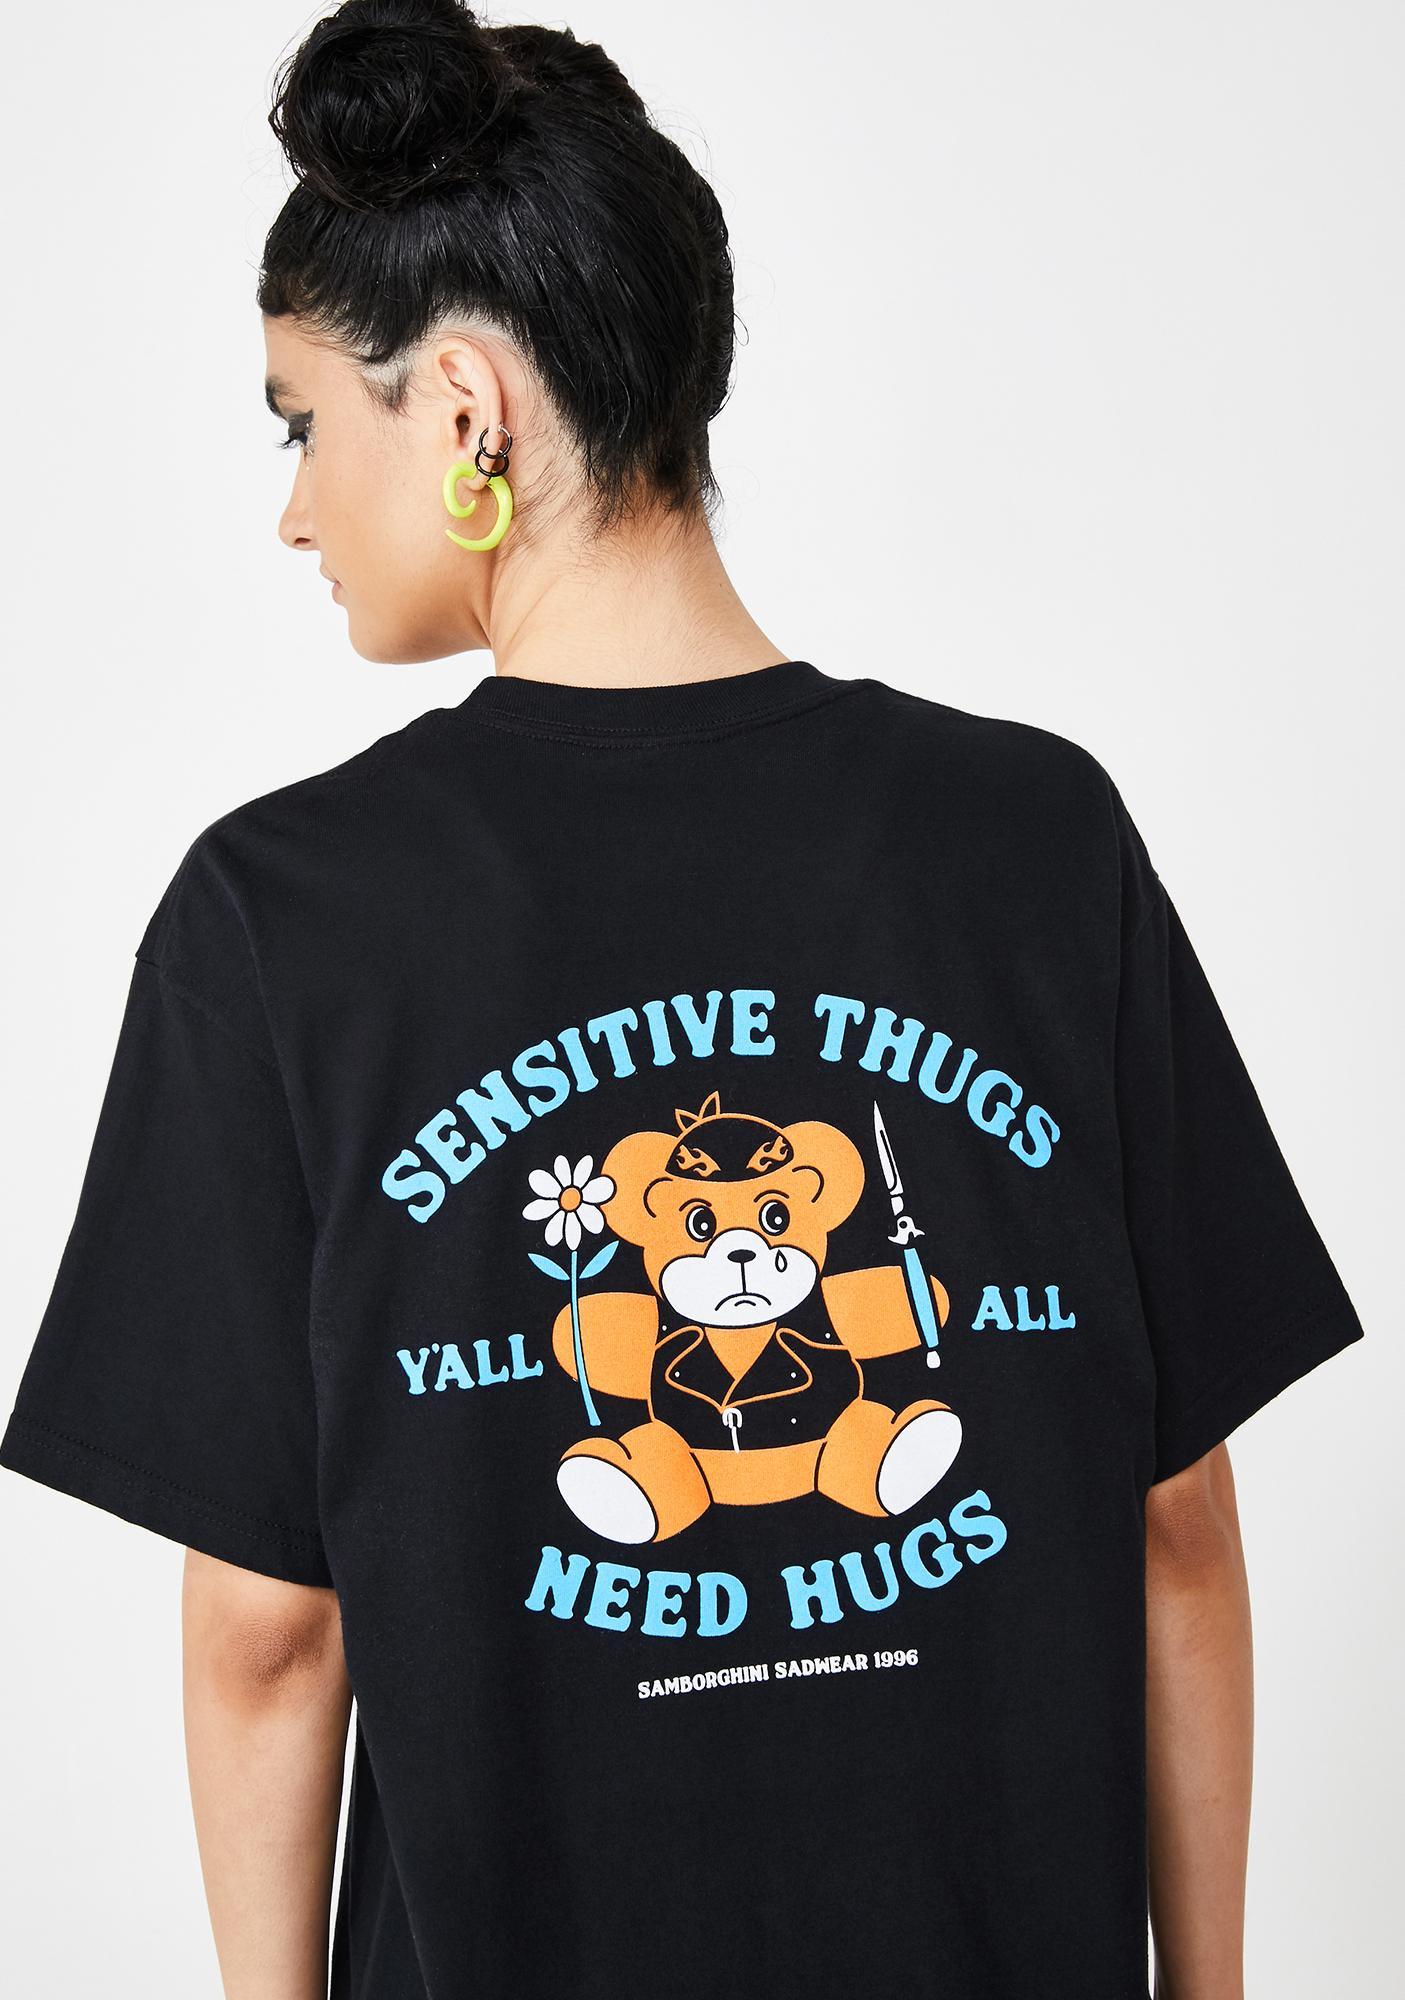 Samborghini Sensitive Thugs Graphic Tee